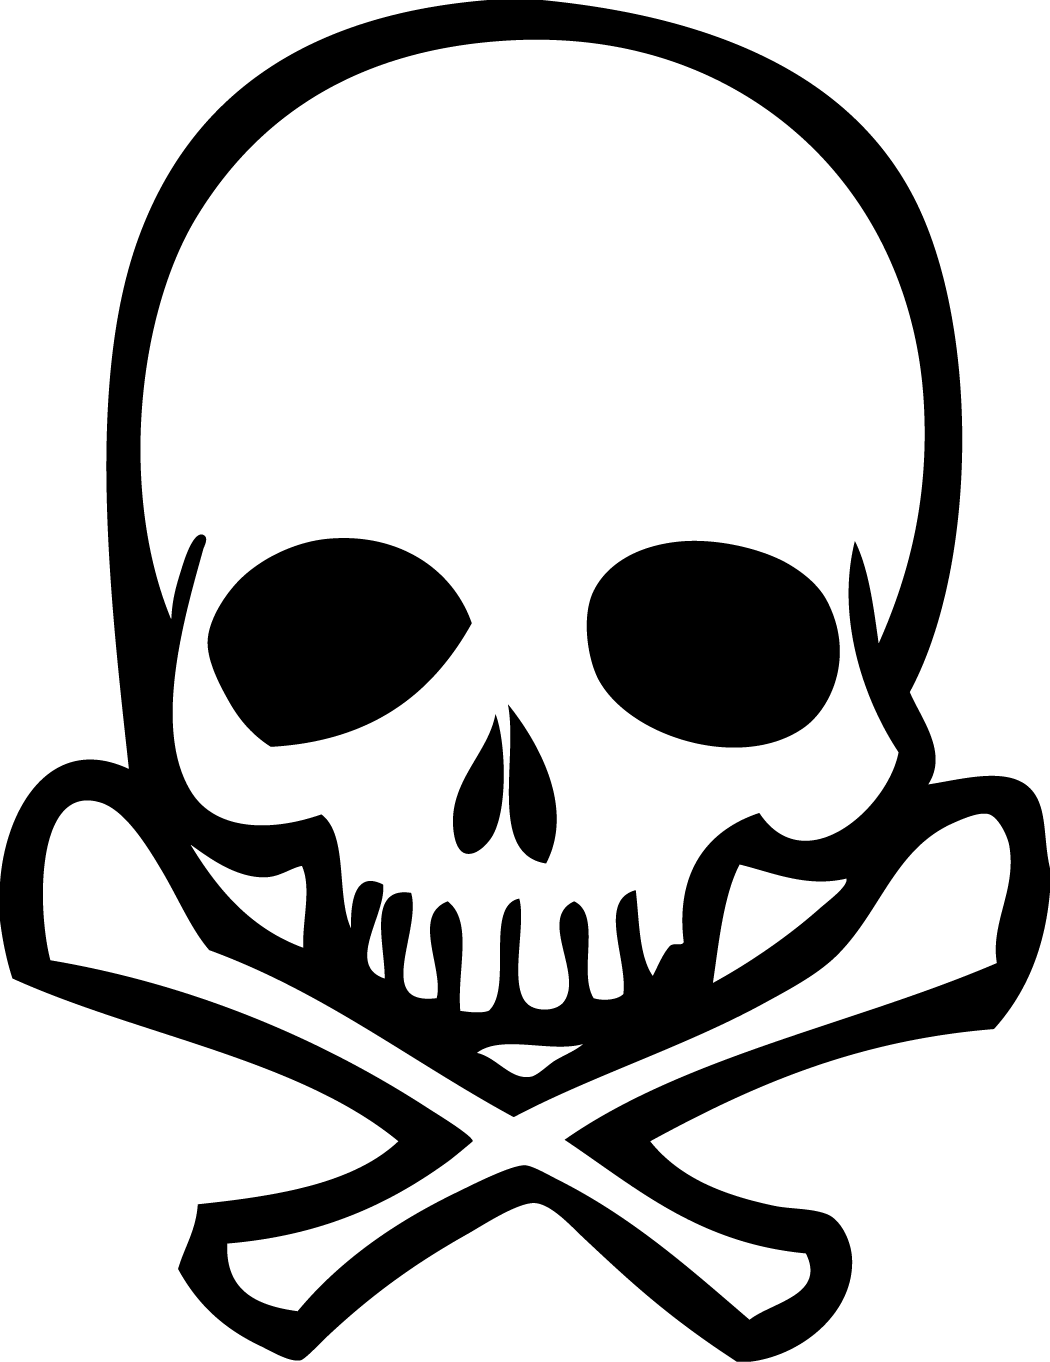 Skull and crossbones Drawing Human skull symbolism Clip art.